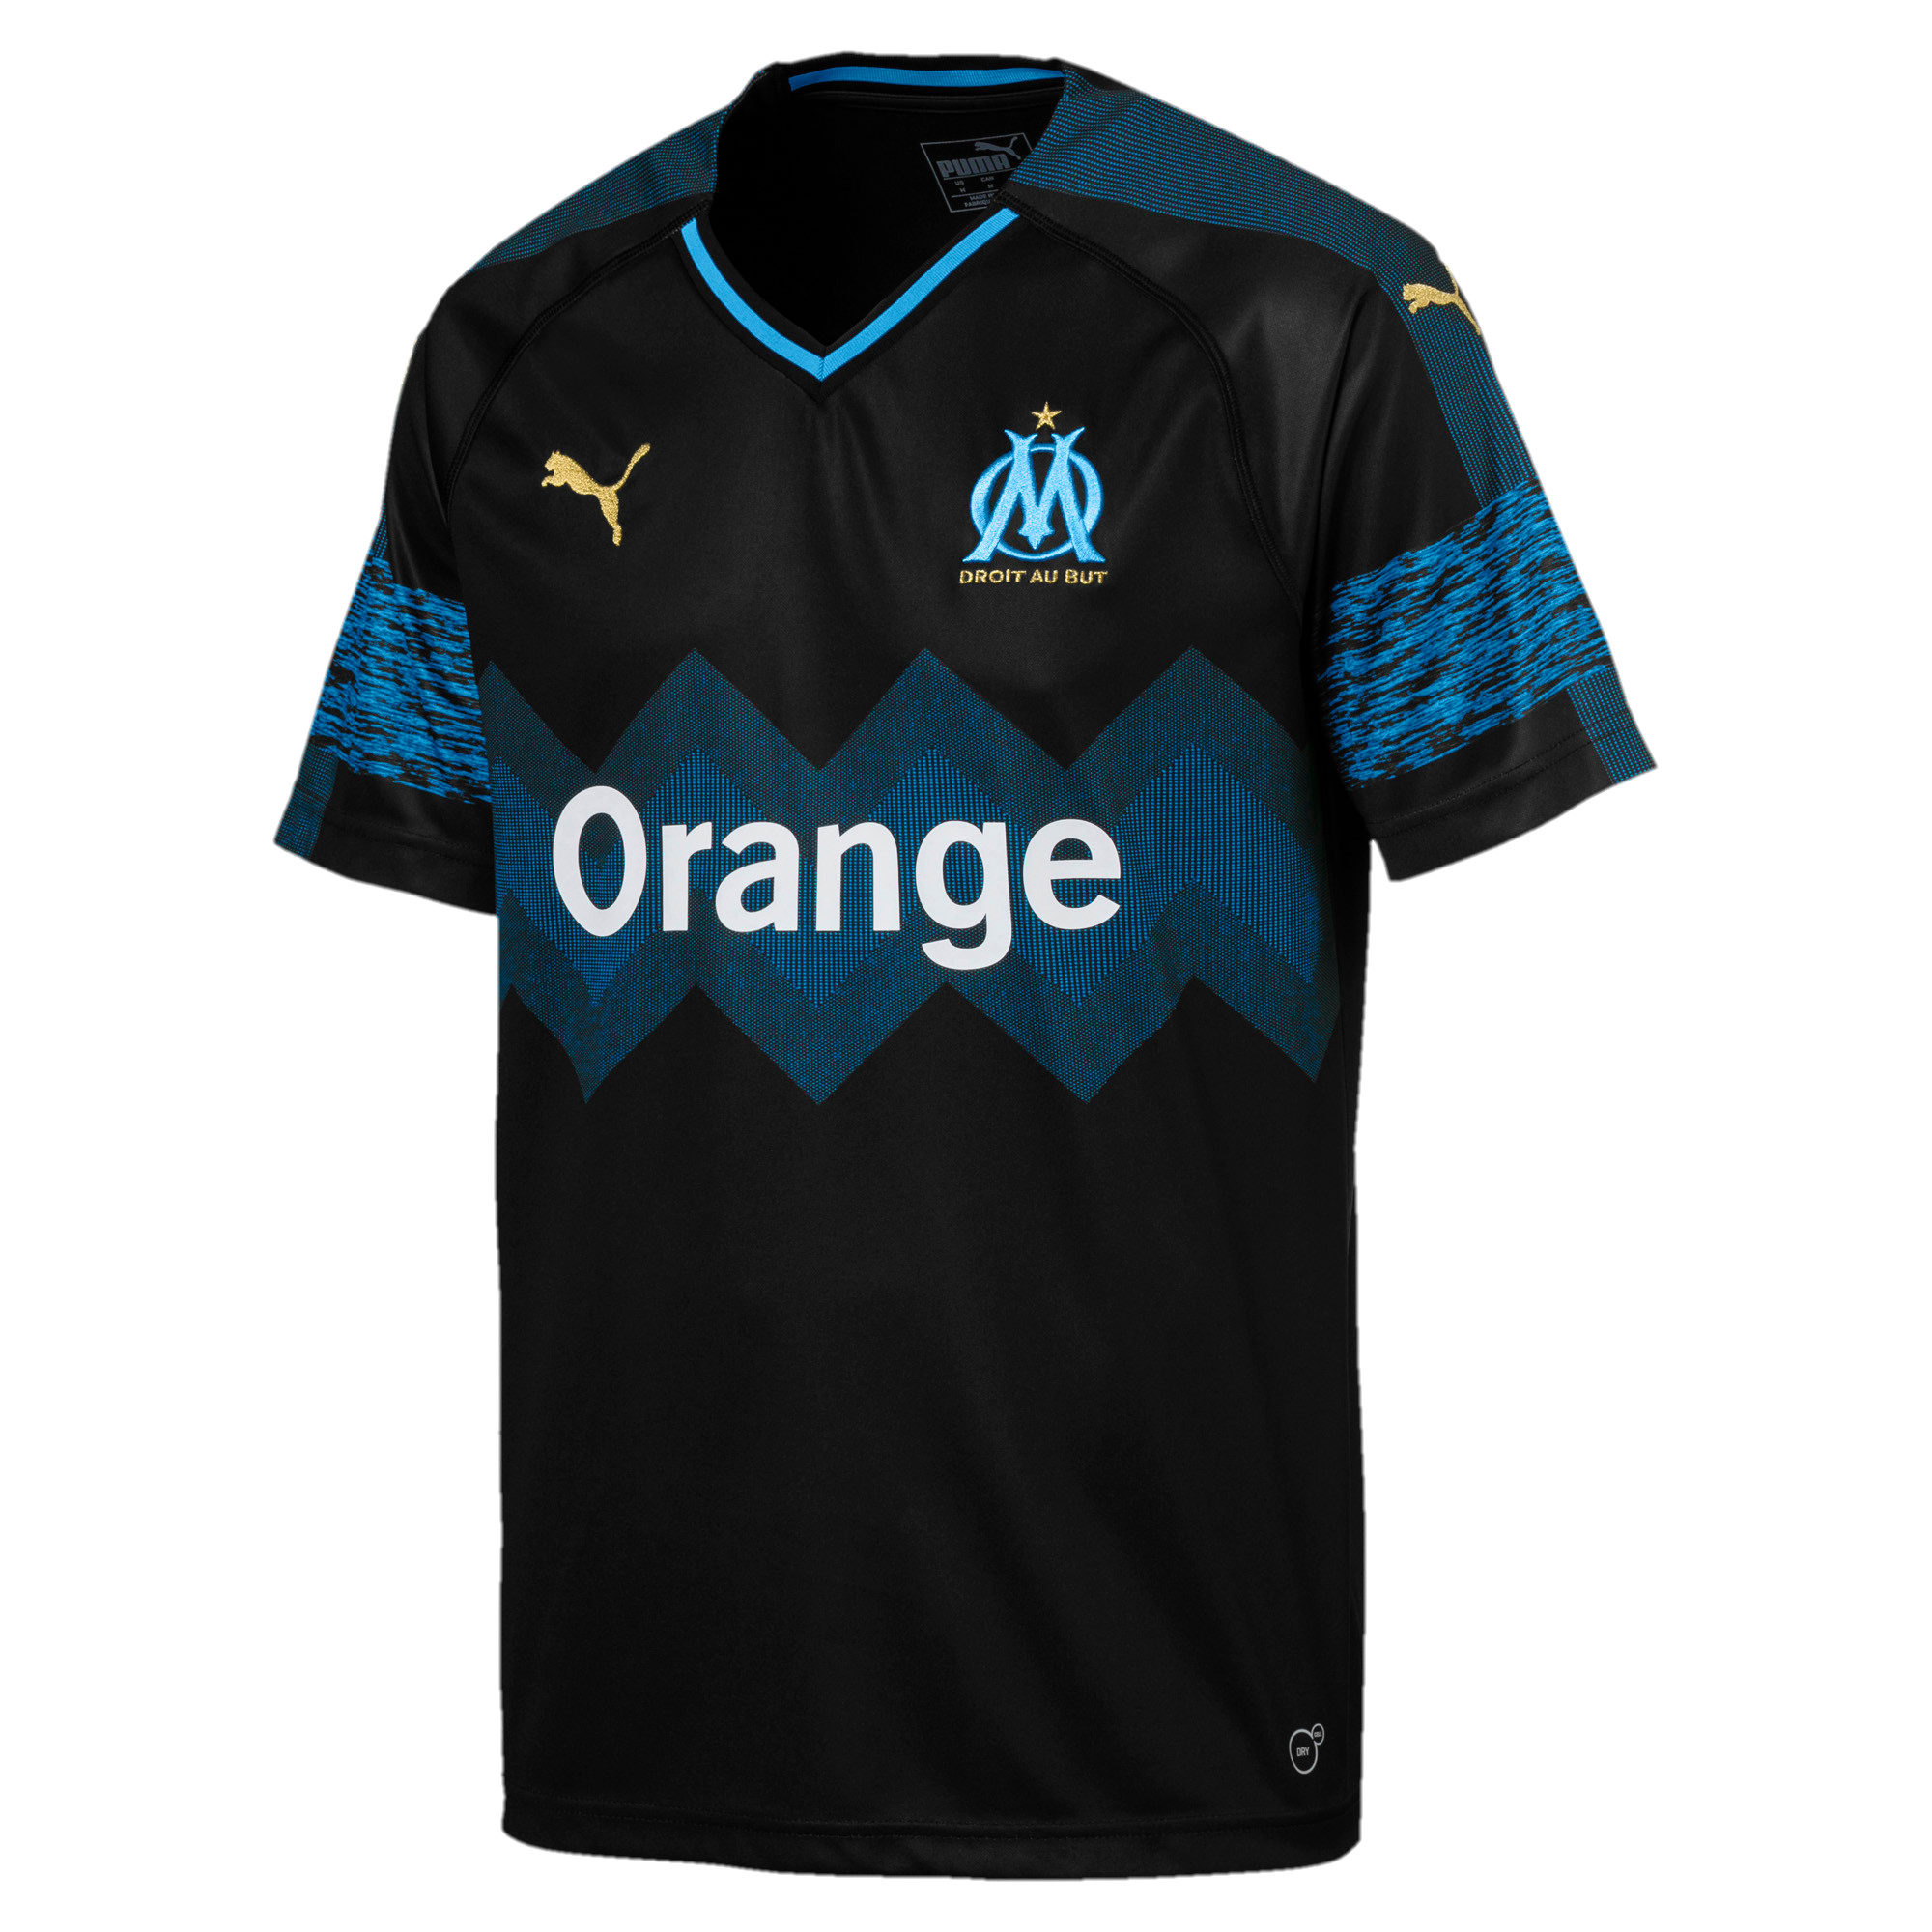 Thumbnail 1 of Olympique de Marseille Men's Away Replica Jersey, Puma Black-Bleu Azur, medium